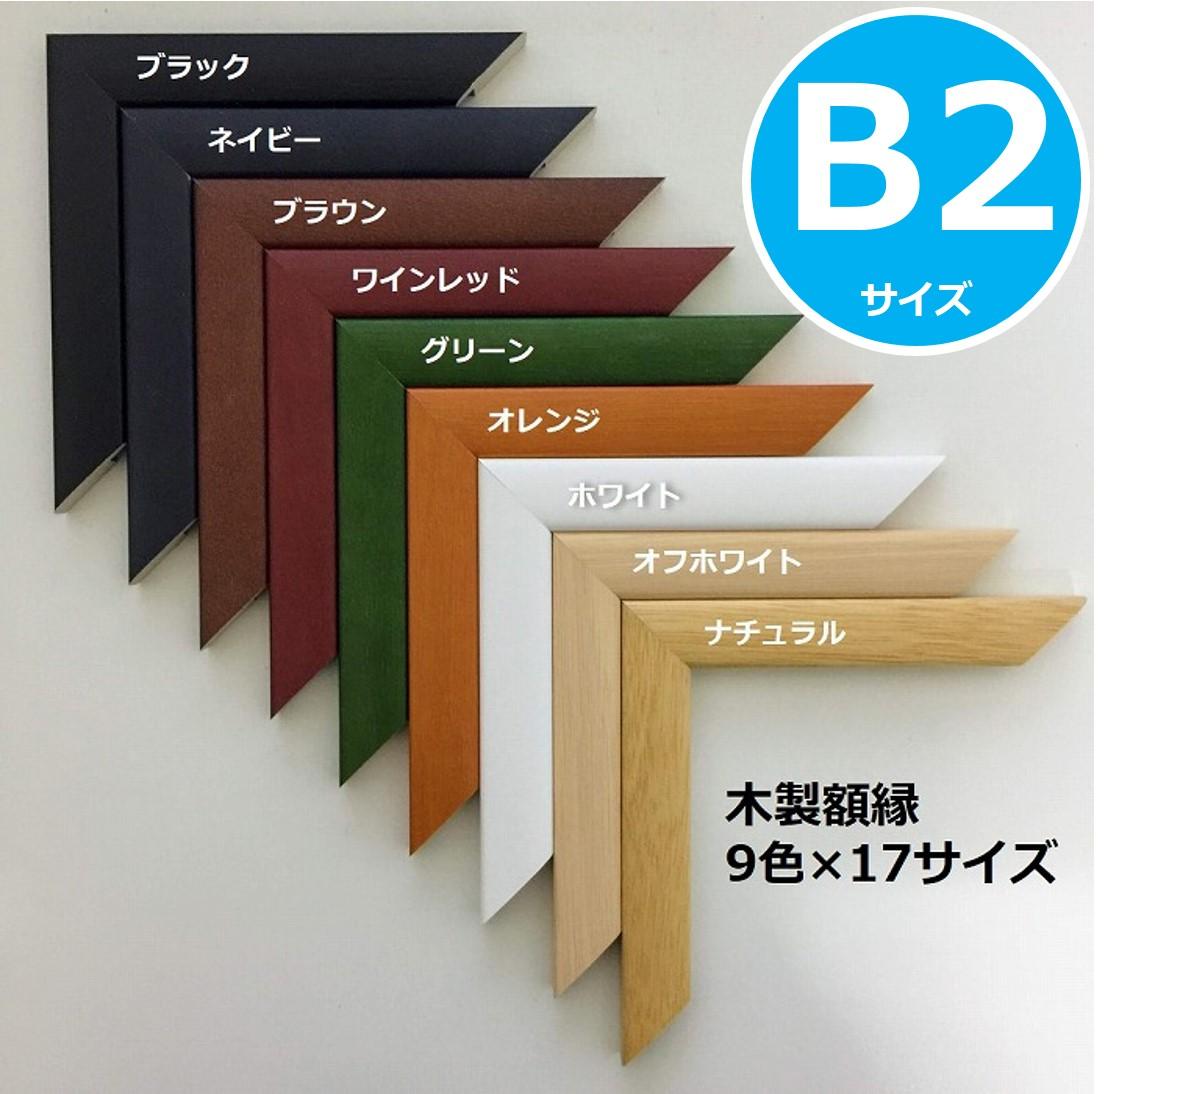 B2 9色から選べる国産木製額縁 超激得SALE 取り扱い簡単サイズも豊富シンプルデザインで大好評 激安 515×728mm ポスターフレーム 国産木製額縁 パネル